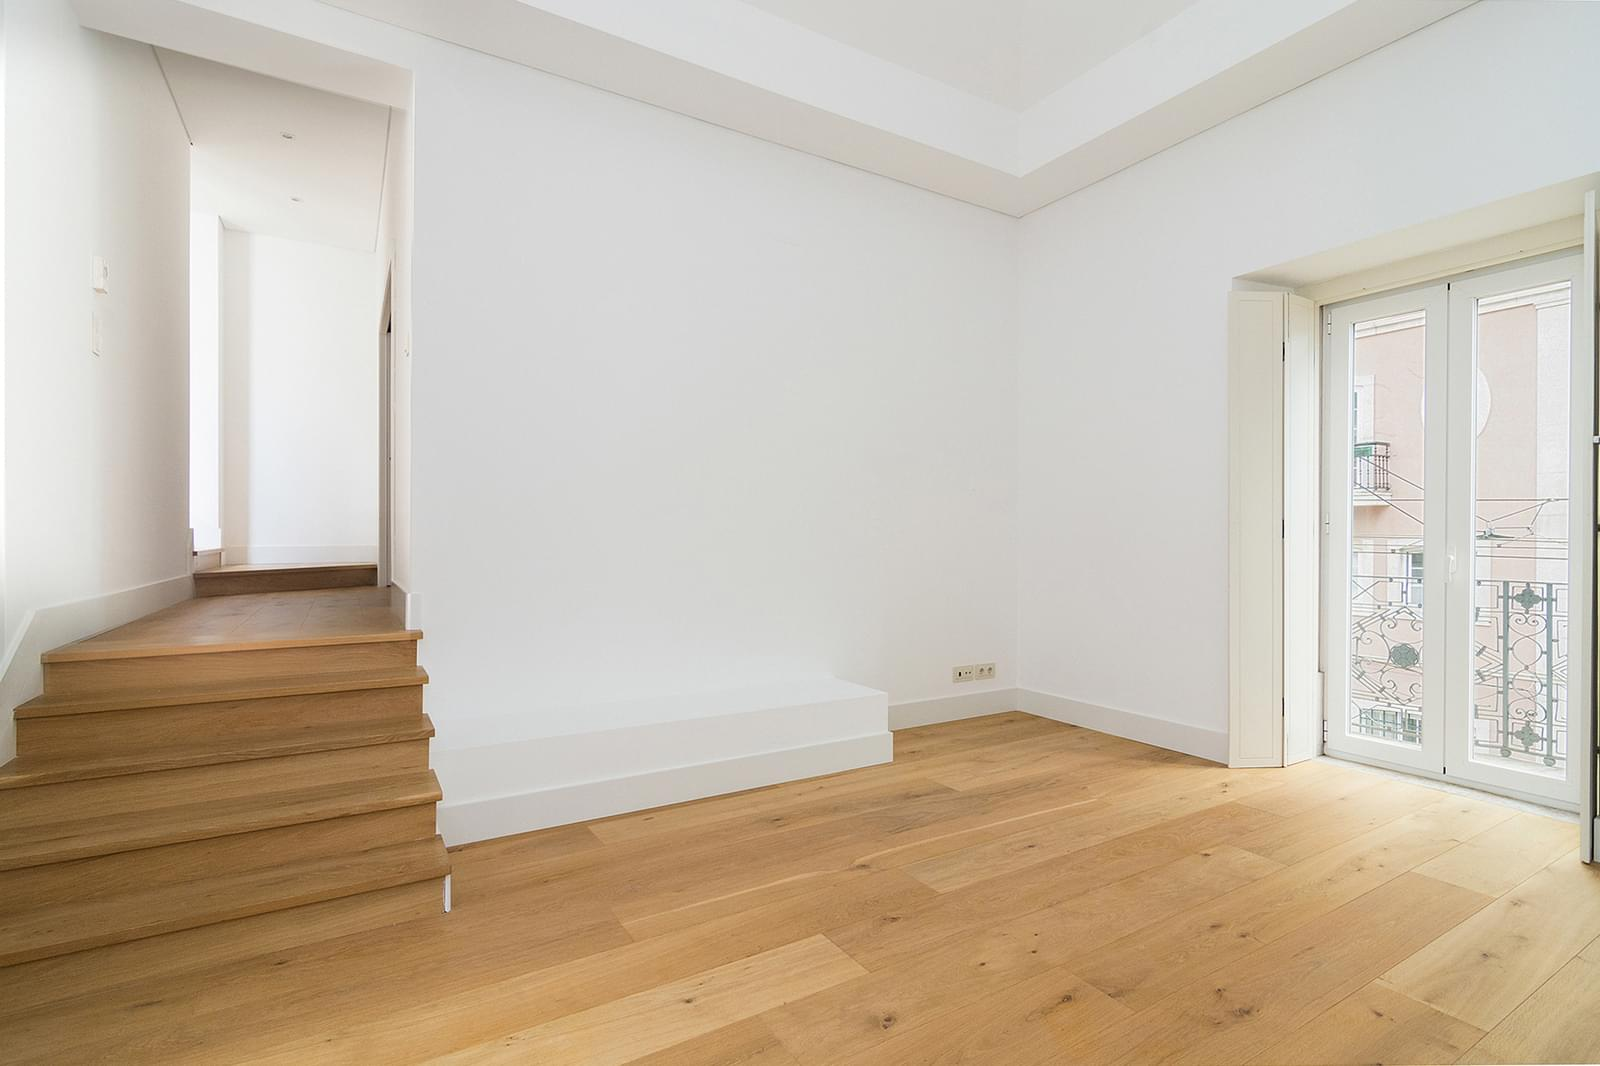 pf16887-apartamento-t5-lisboa-f4eb7a0d-ea4b-40cc-8555-02d62c3582c5